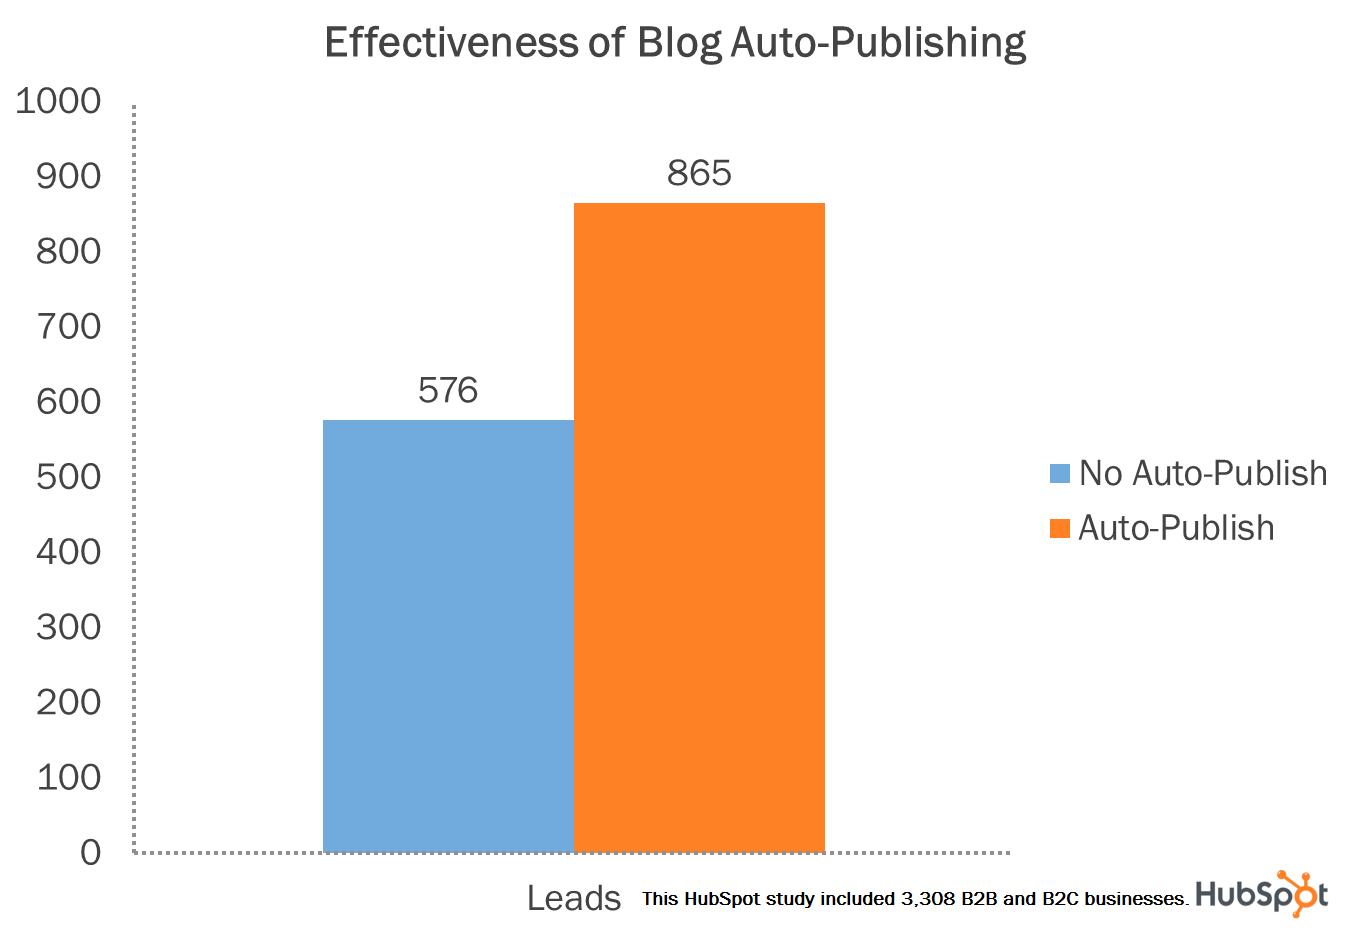 blog auto publish lead generation